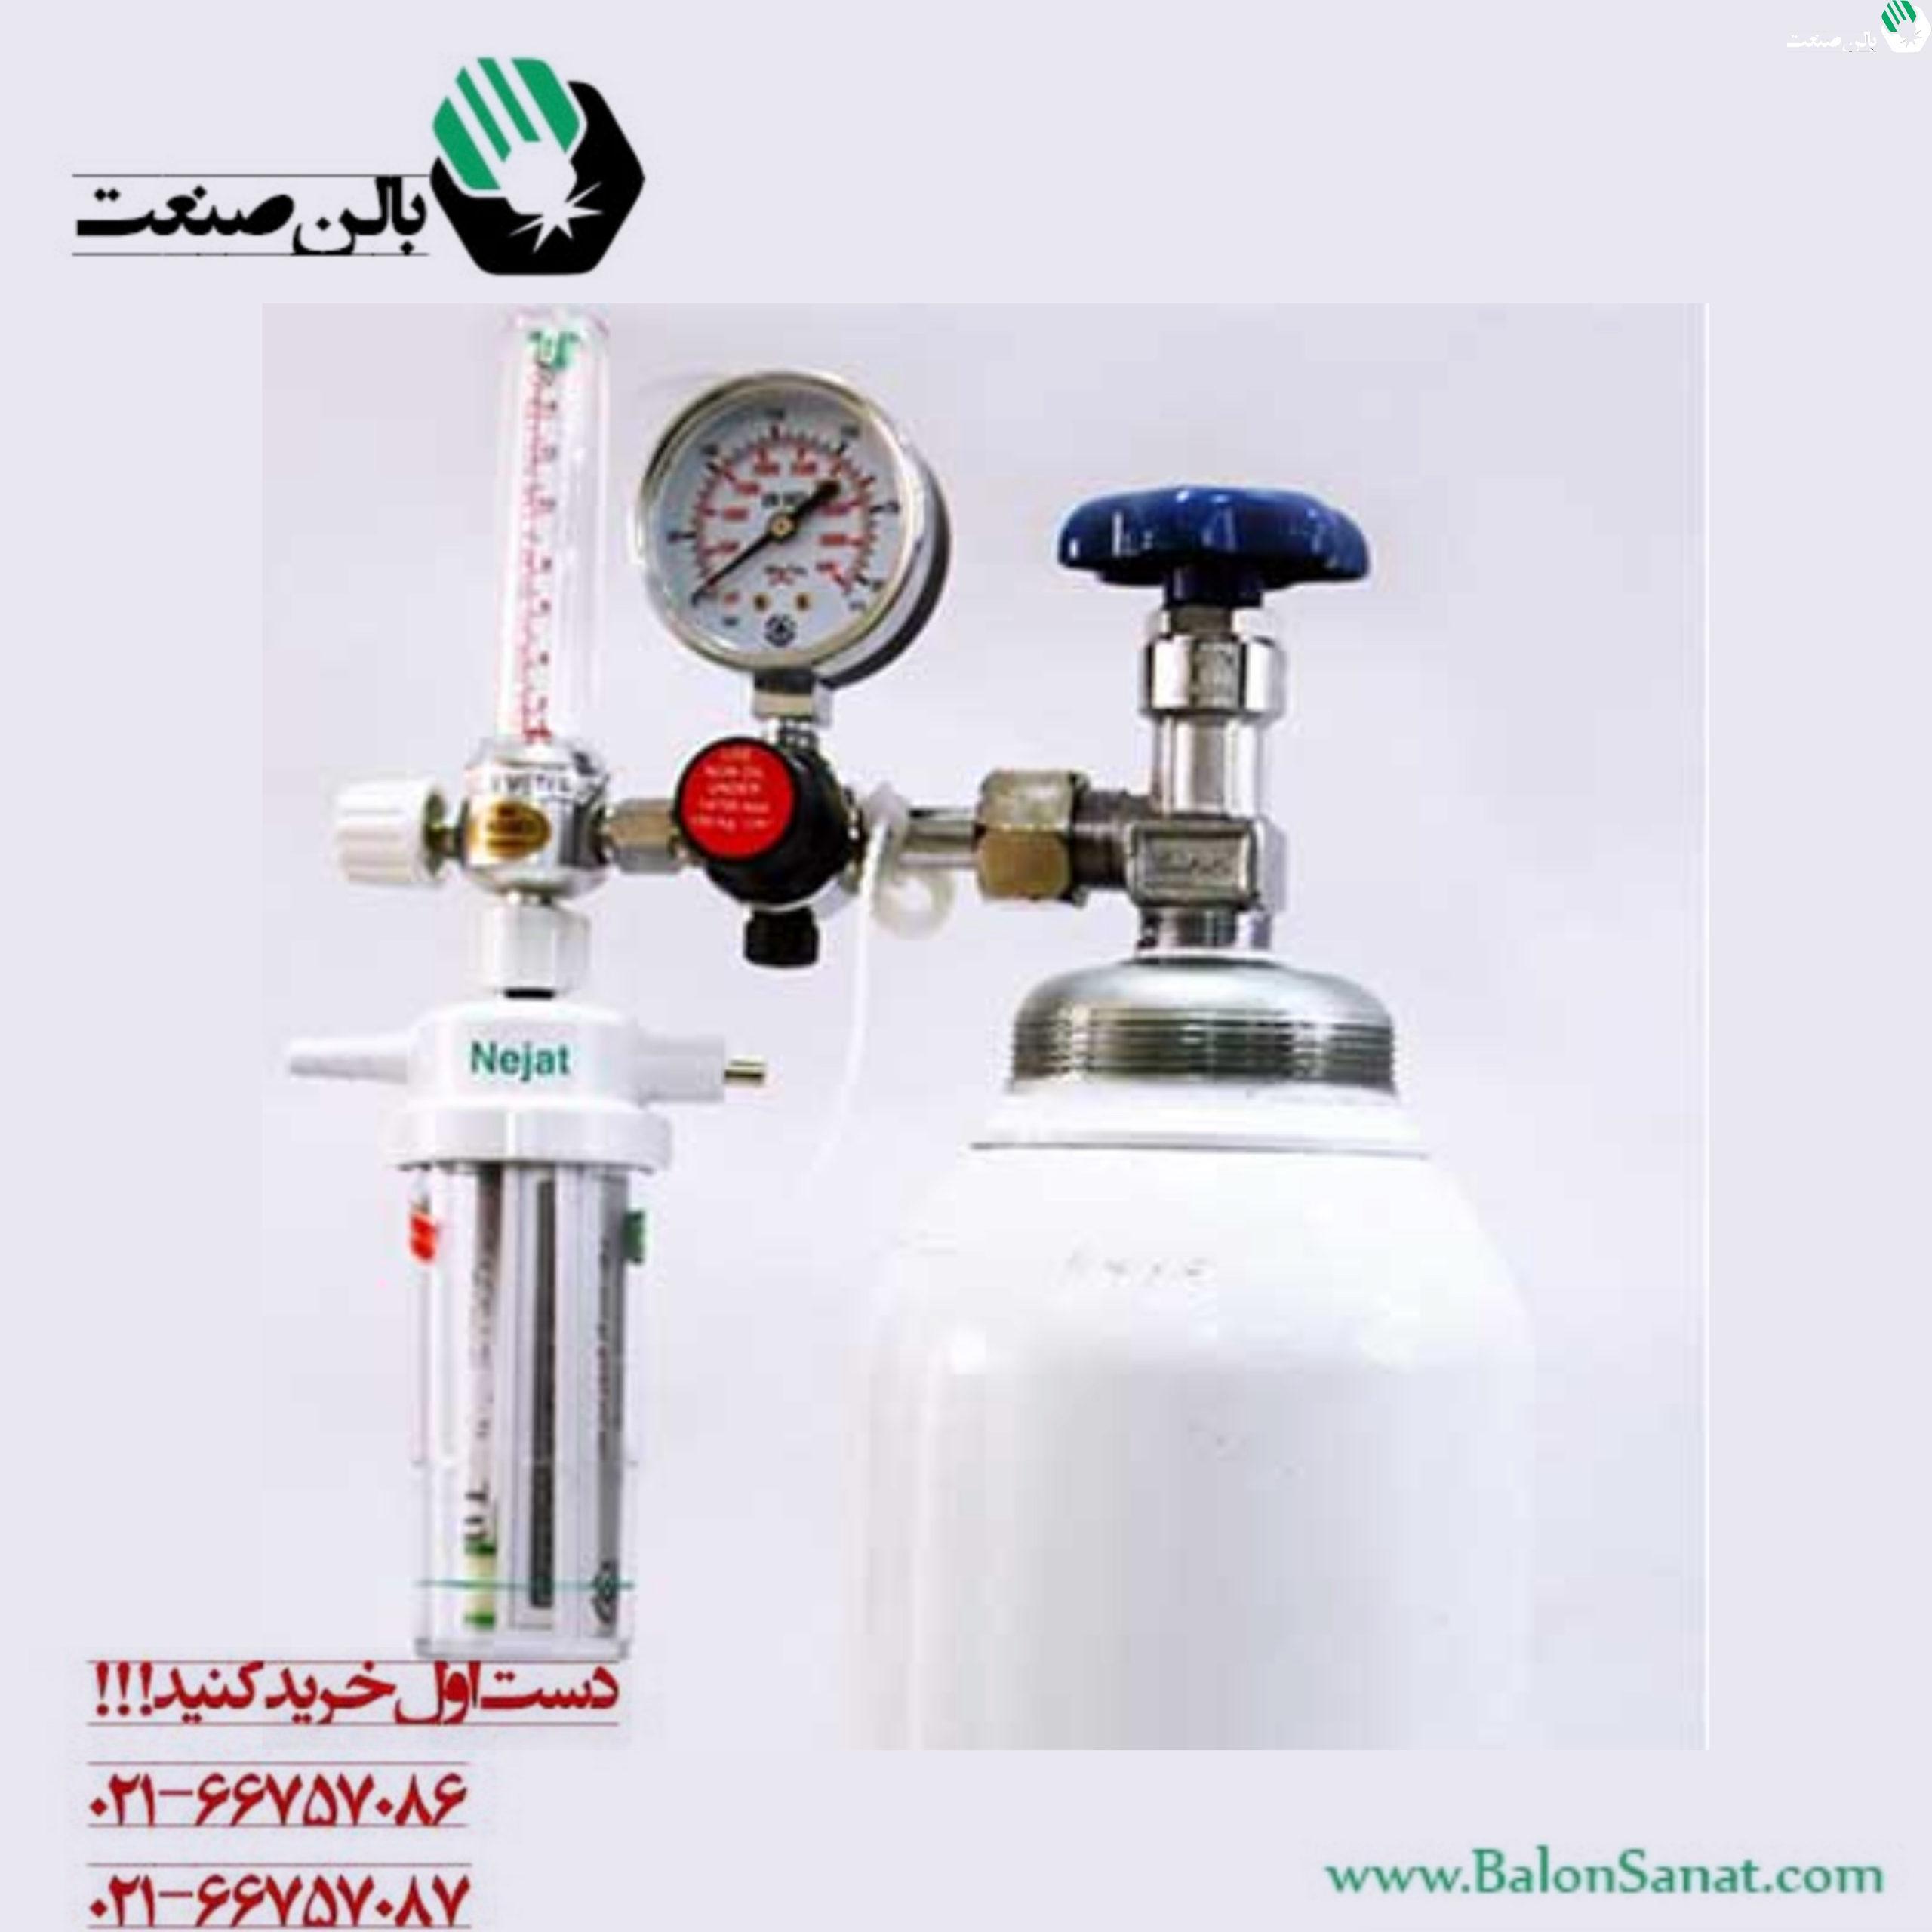 کپسول اکسیژن و مانومتر